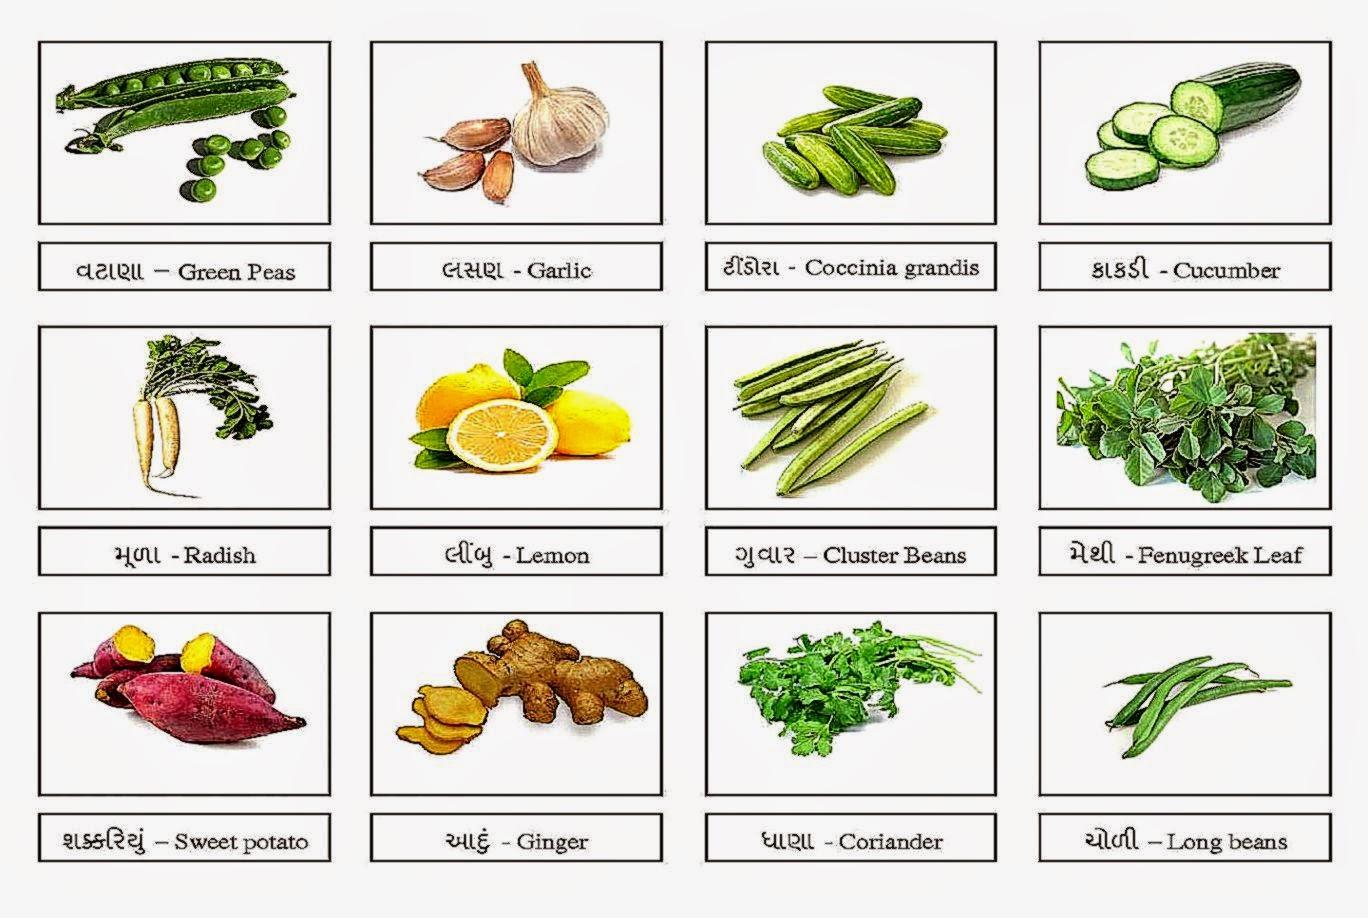 Vegetable Names | Amazing Wallpapers | 1368 x 918 jpeg 196kB